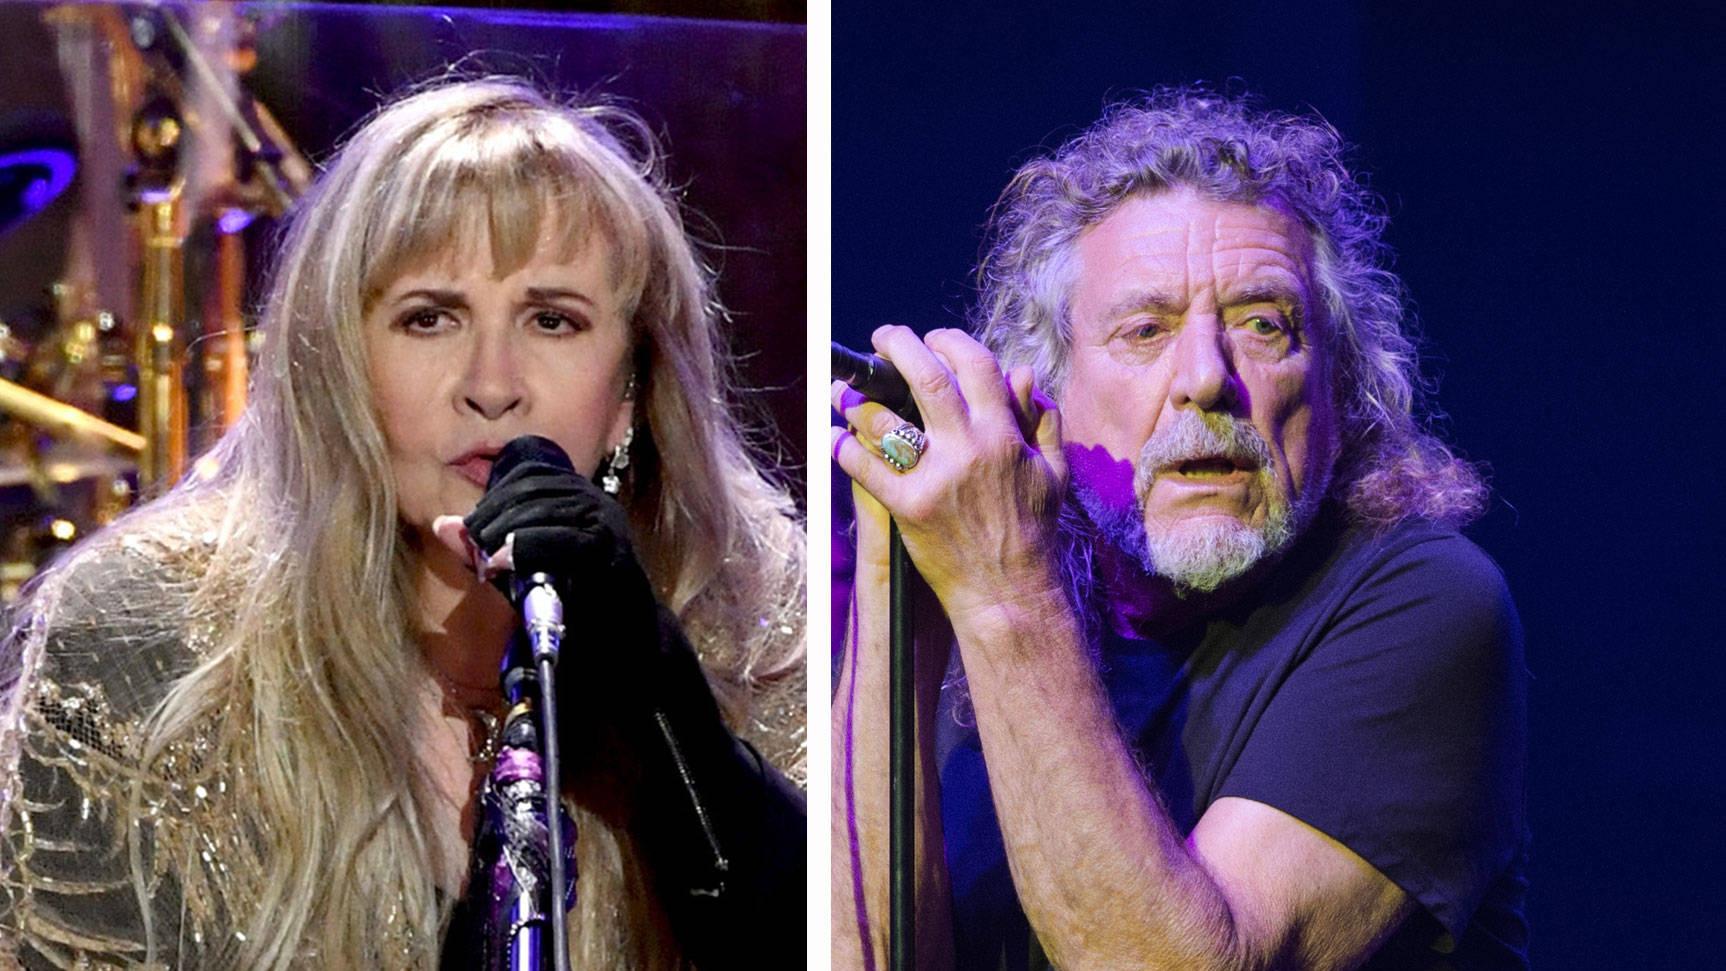 Fleetwood Mac and Led Zeppelin ruled out of headlining Glastonbury 2020